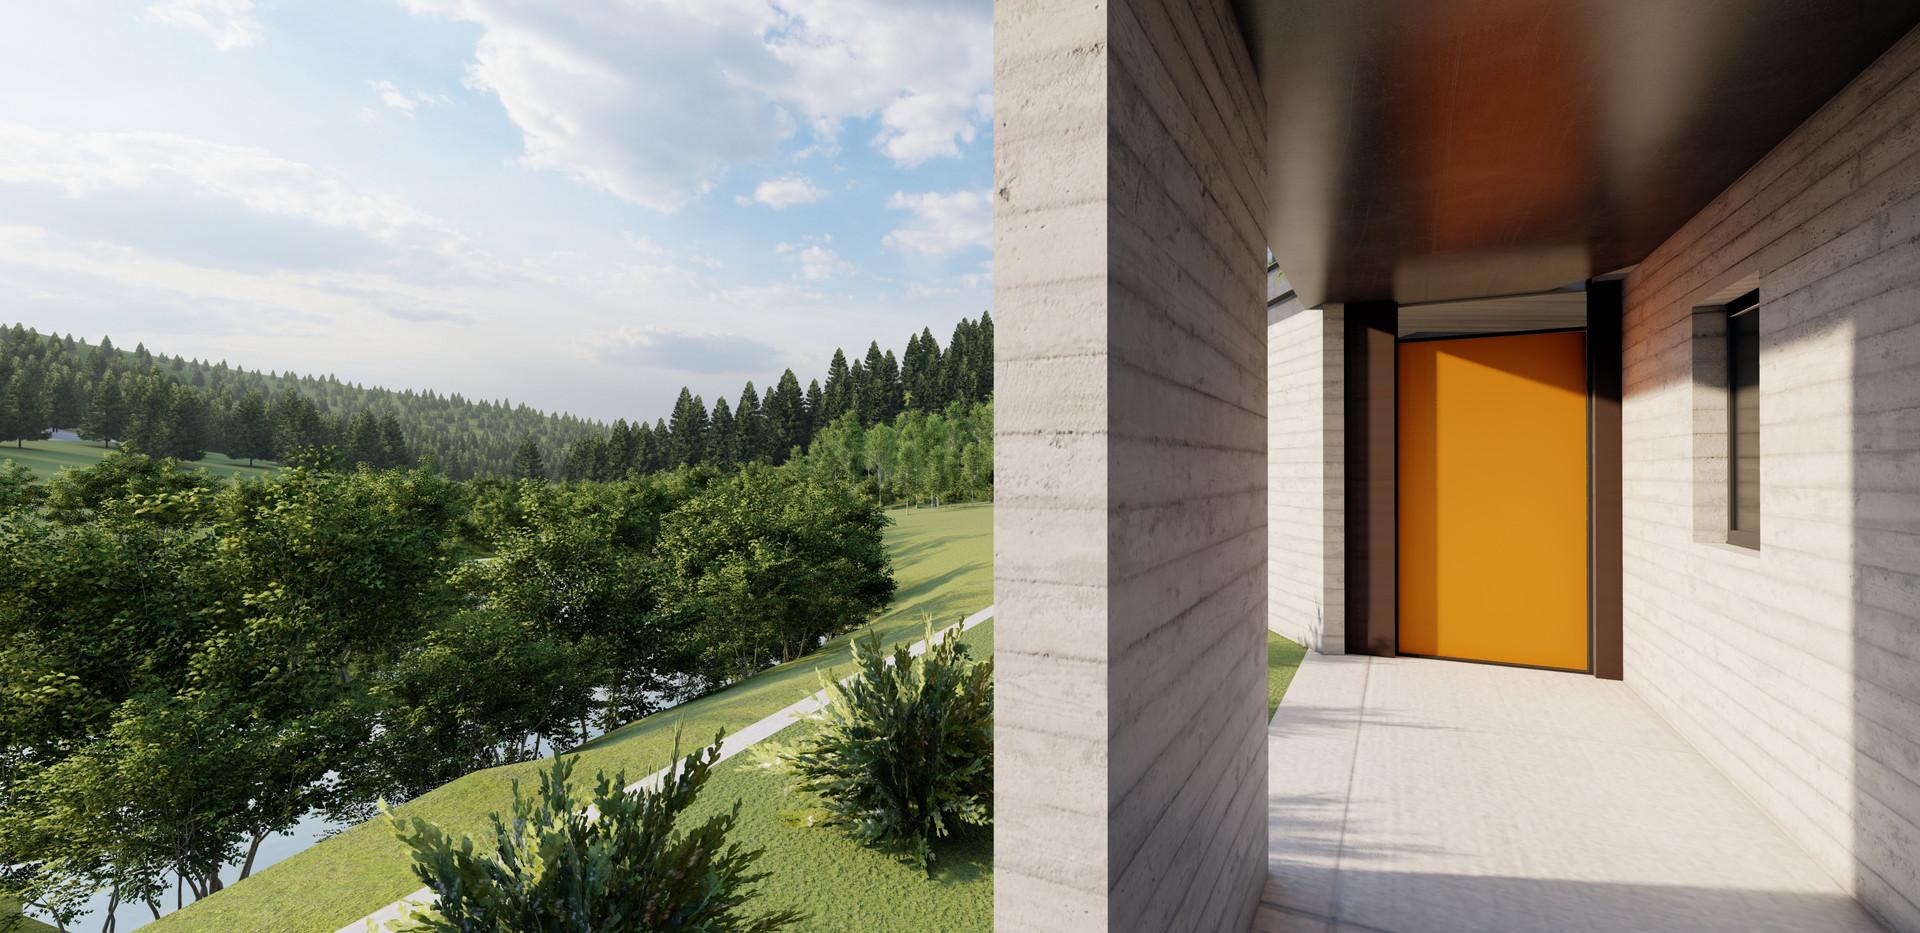 Creekside Terrace - Entry View.jpg